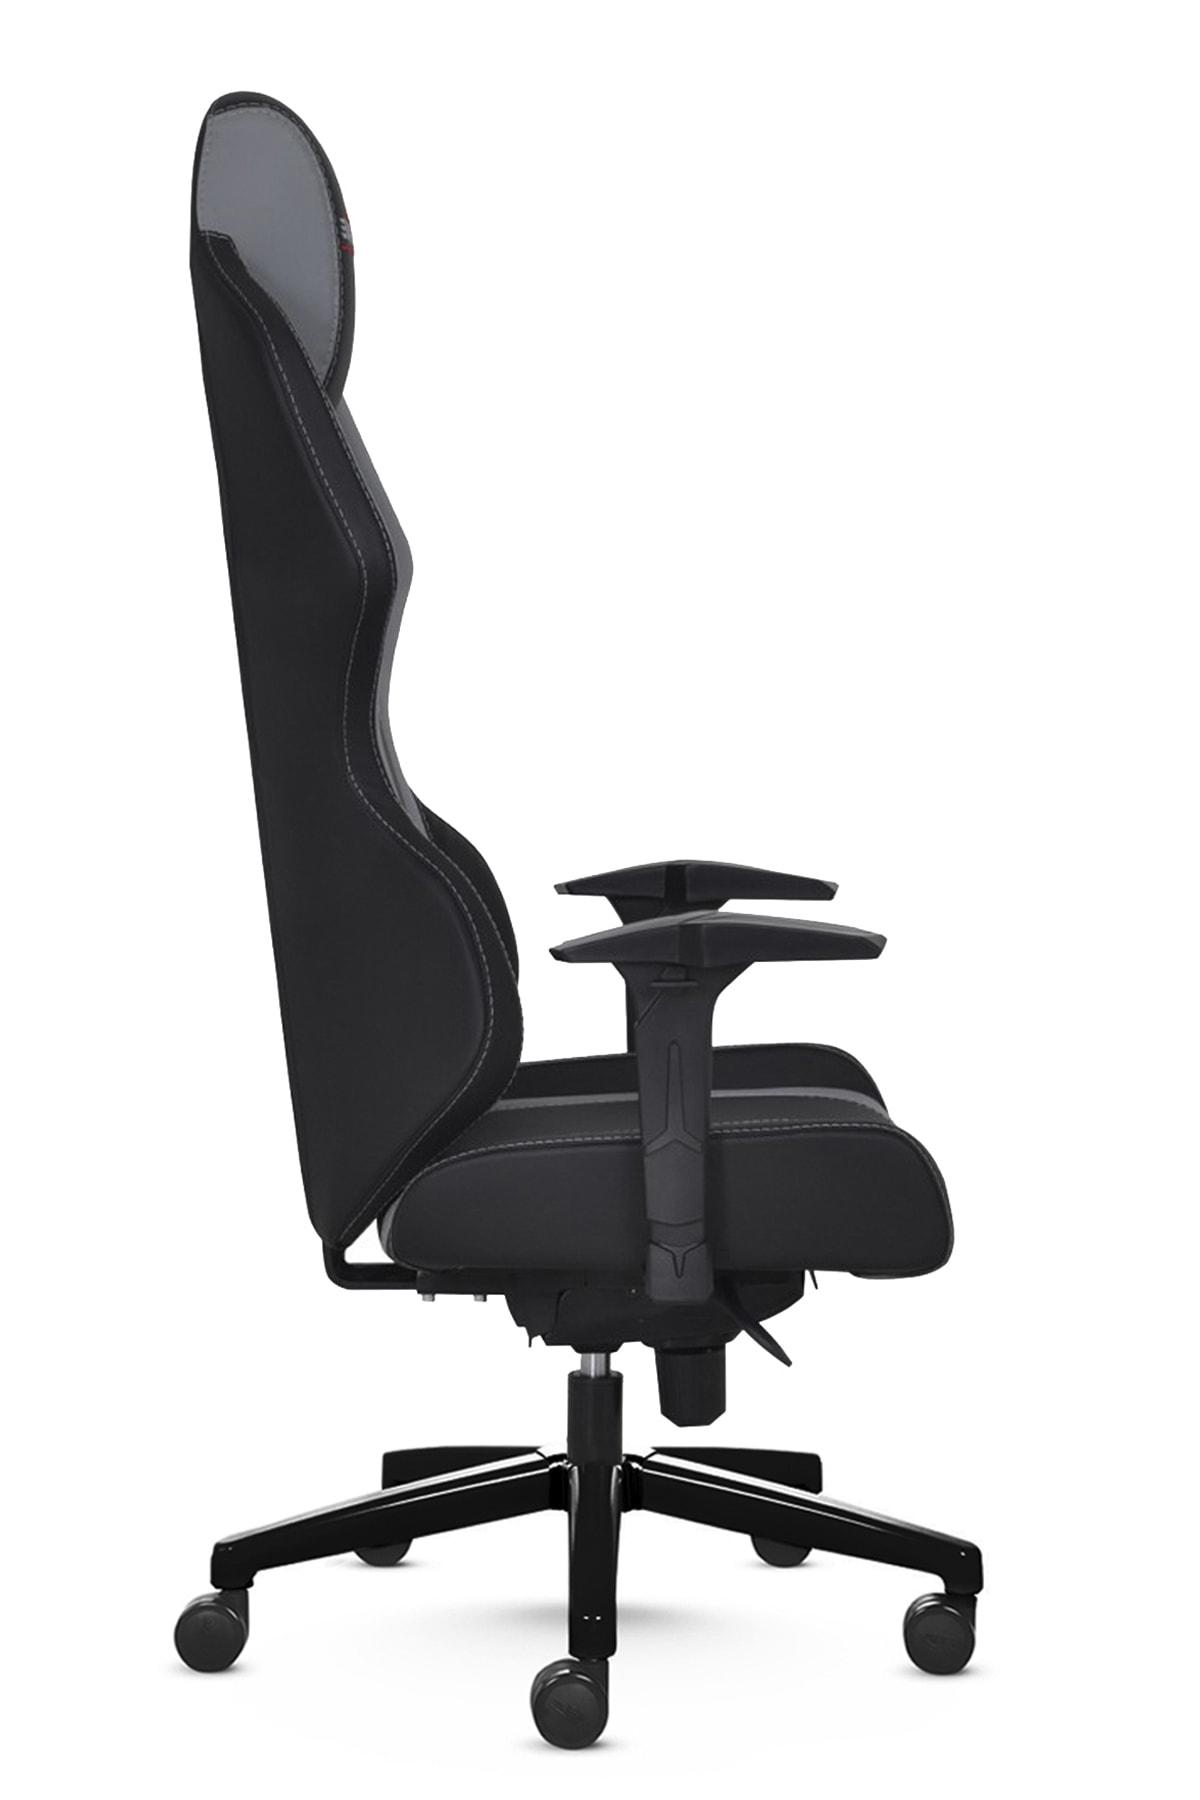 XDrive Bora Profesyonel Oyuncu Koltuğu Gri/siyah 2